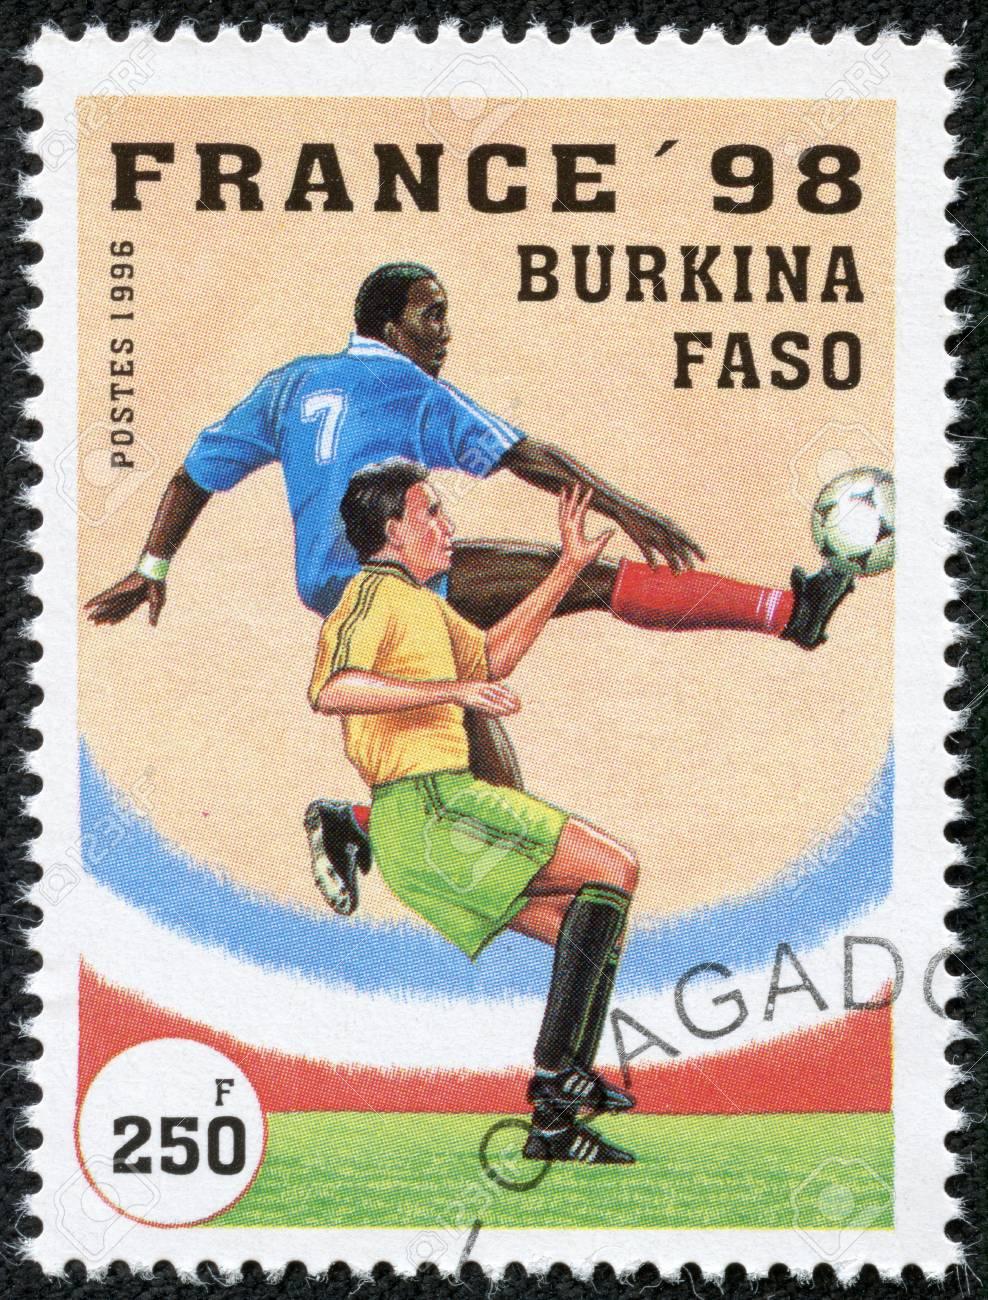 BURKINA FASO - CIRCA 1996  A stamp printed by Burkina Faso, shows 1998 World Cup Soccer Championships, France, circa 1996  Stock Photo - 17554725